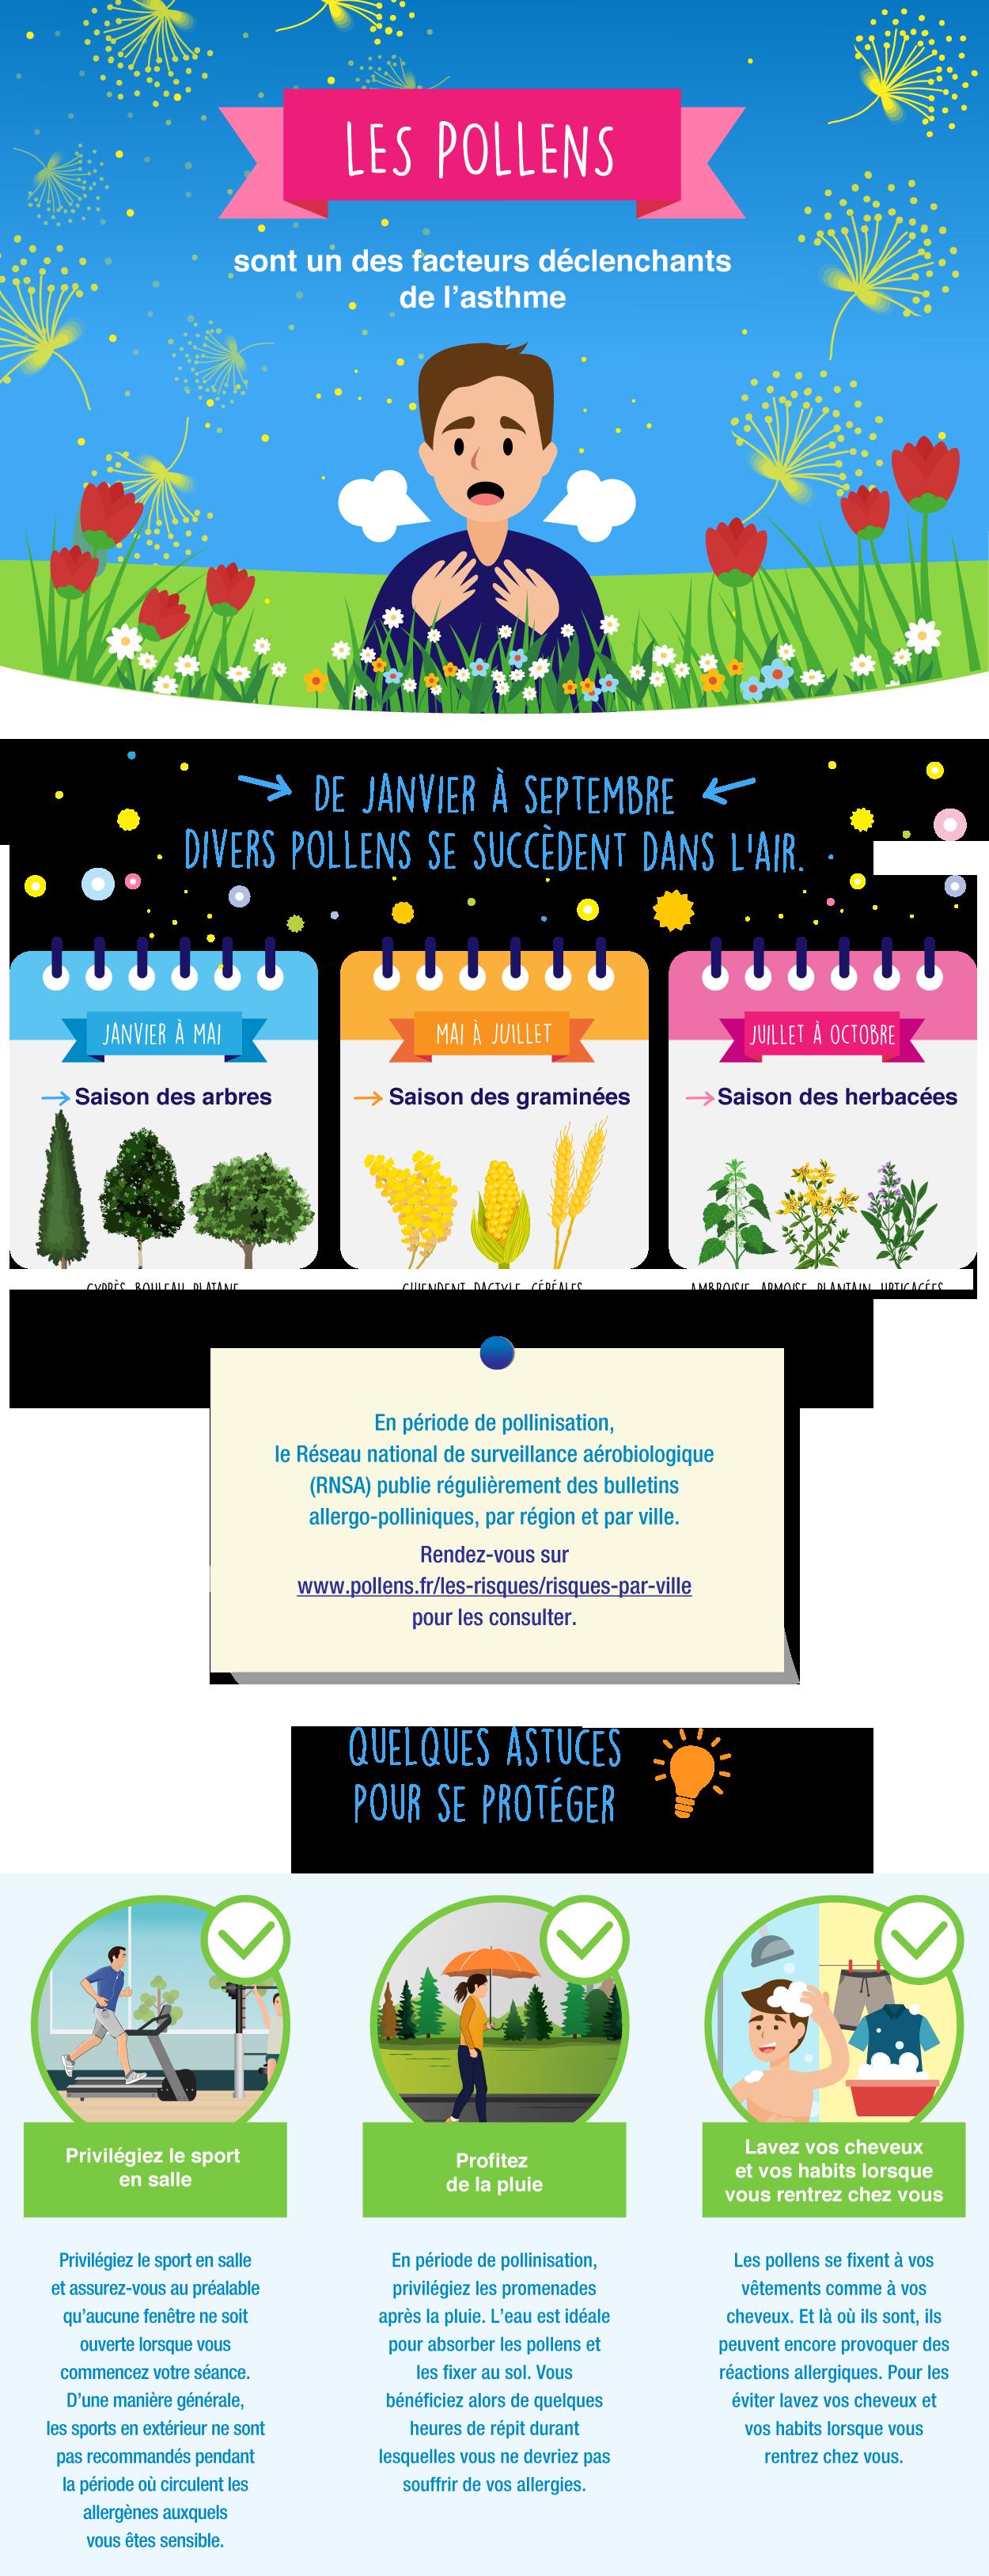 calendrier des pollens